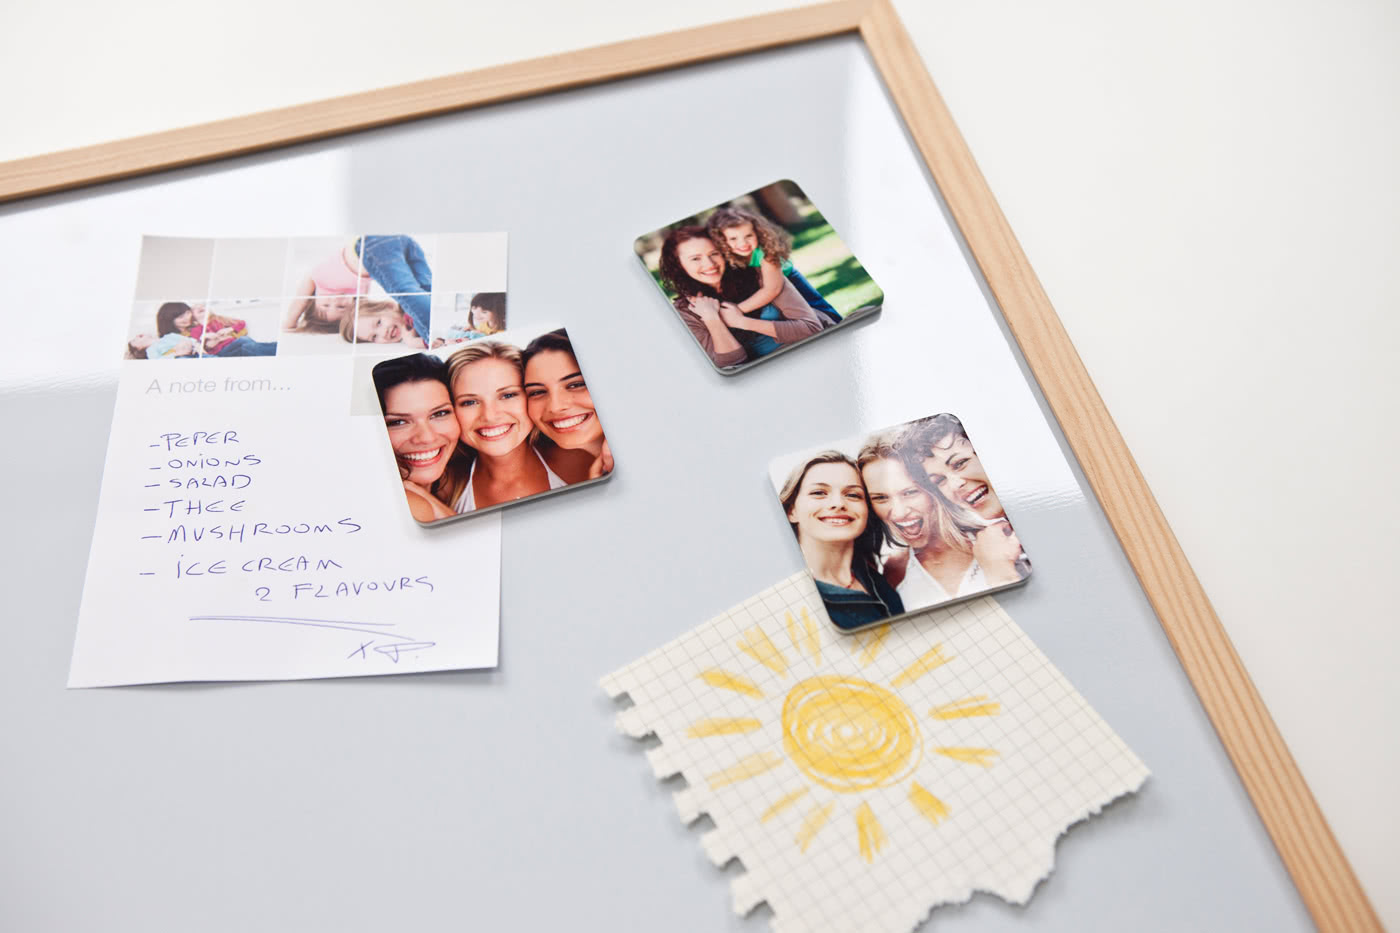 foto-magnete, magnete mit foto bedrucken - selbsthaftende magnete